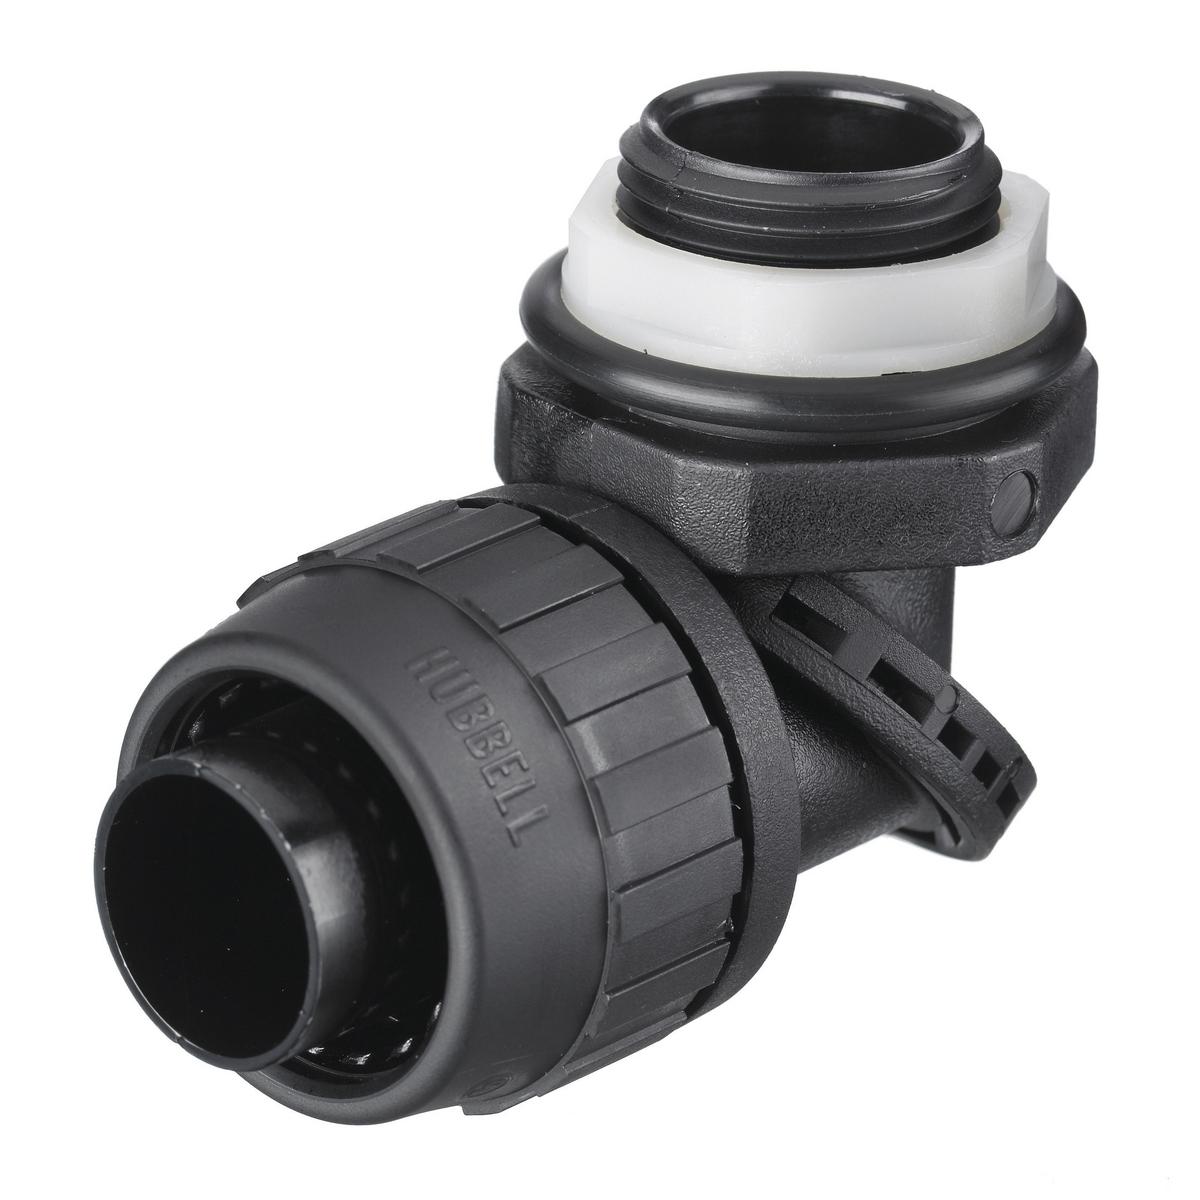 Hubbell PS0759NBK Liquidtight Conduit Connector